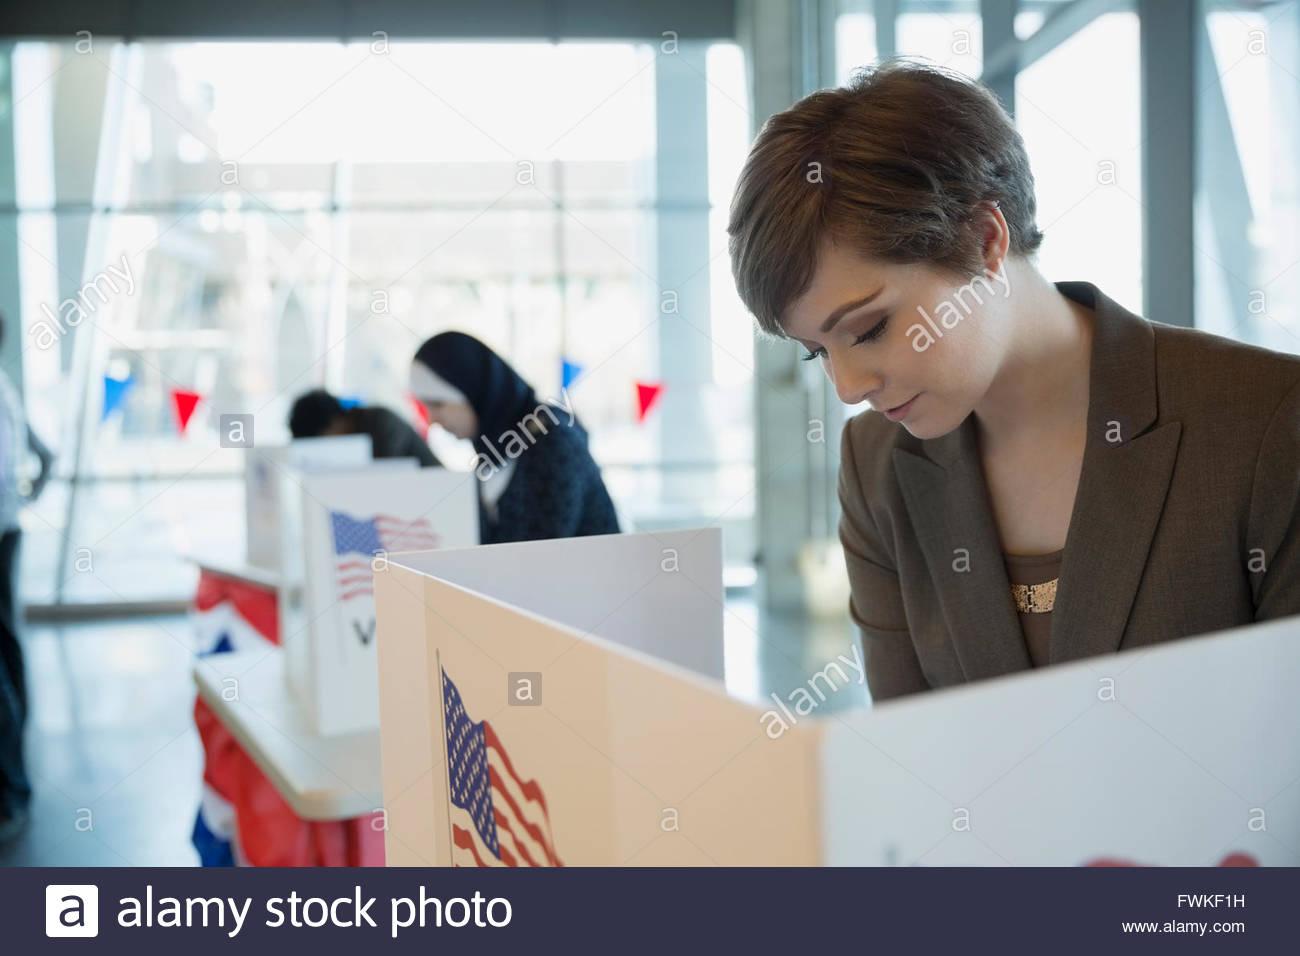 Junge Frau bei der Abstimmung stand im Wahllokal Stockbild